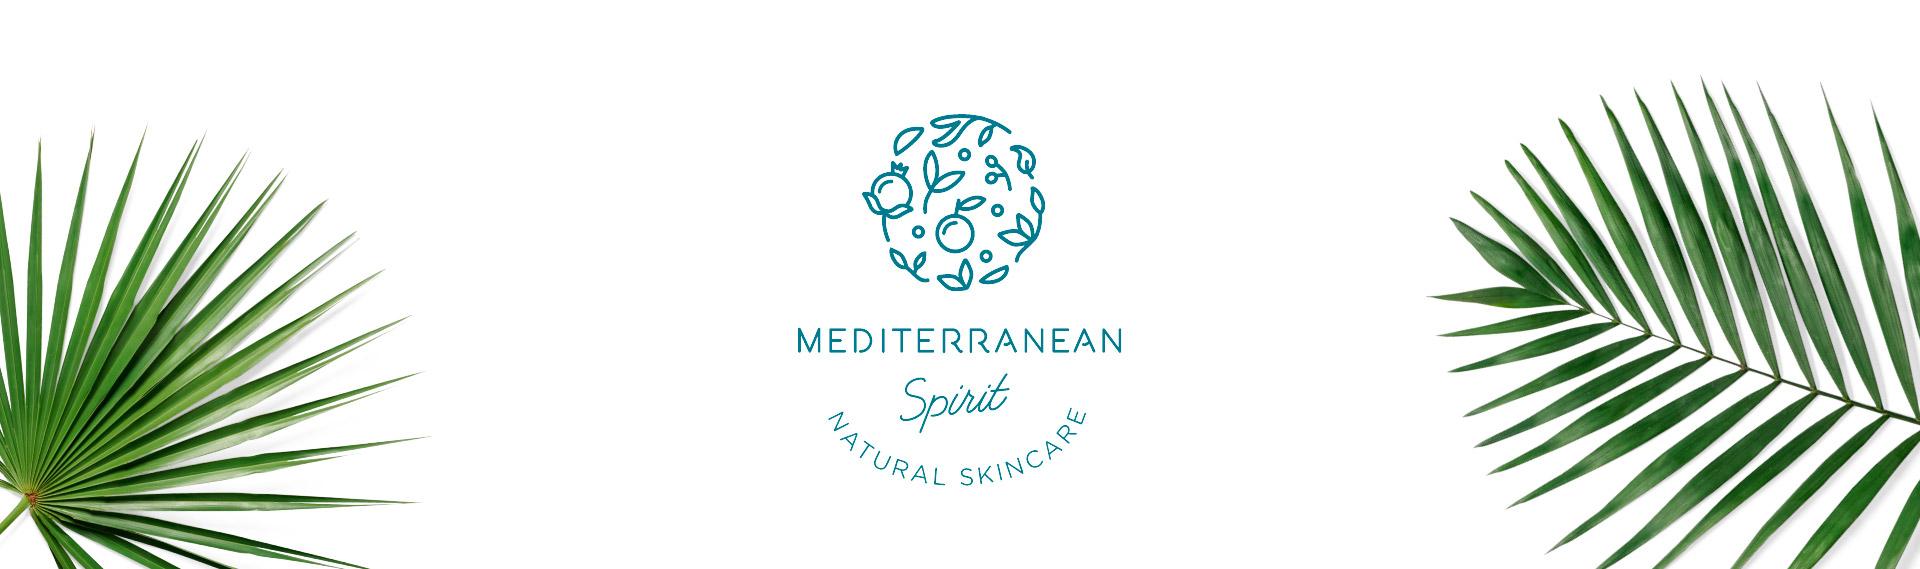 Imagen Mediterranean Spirit img-total